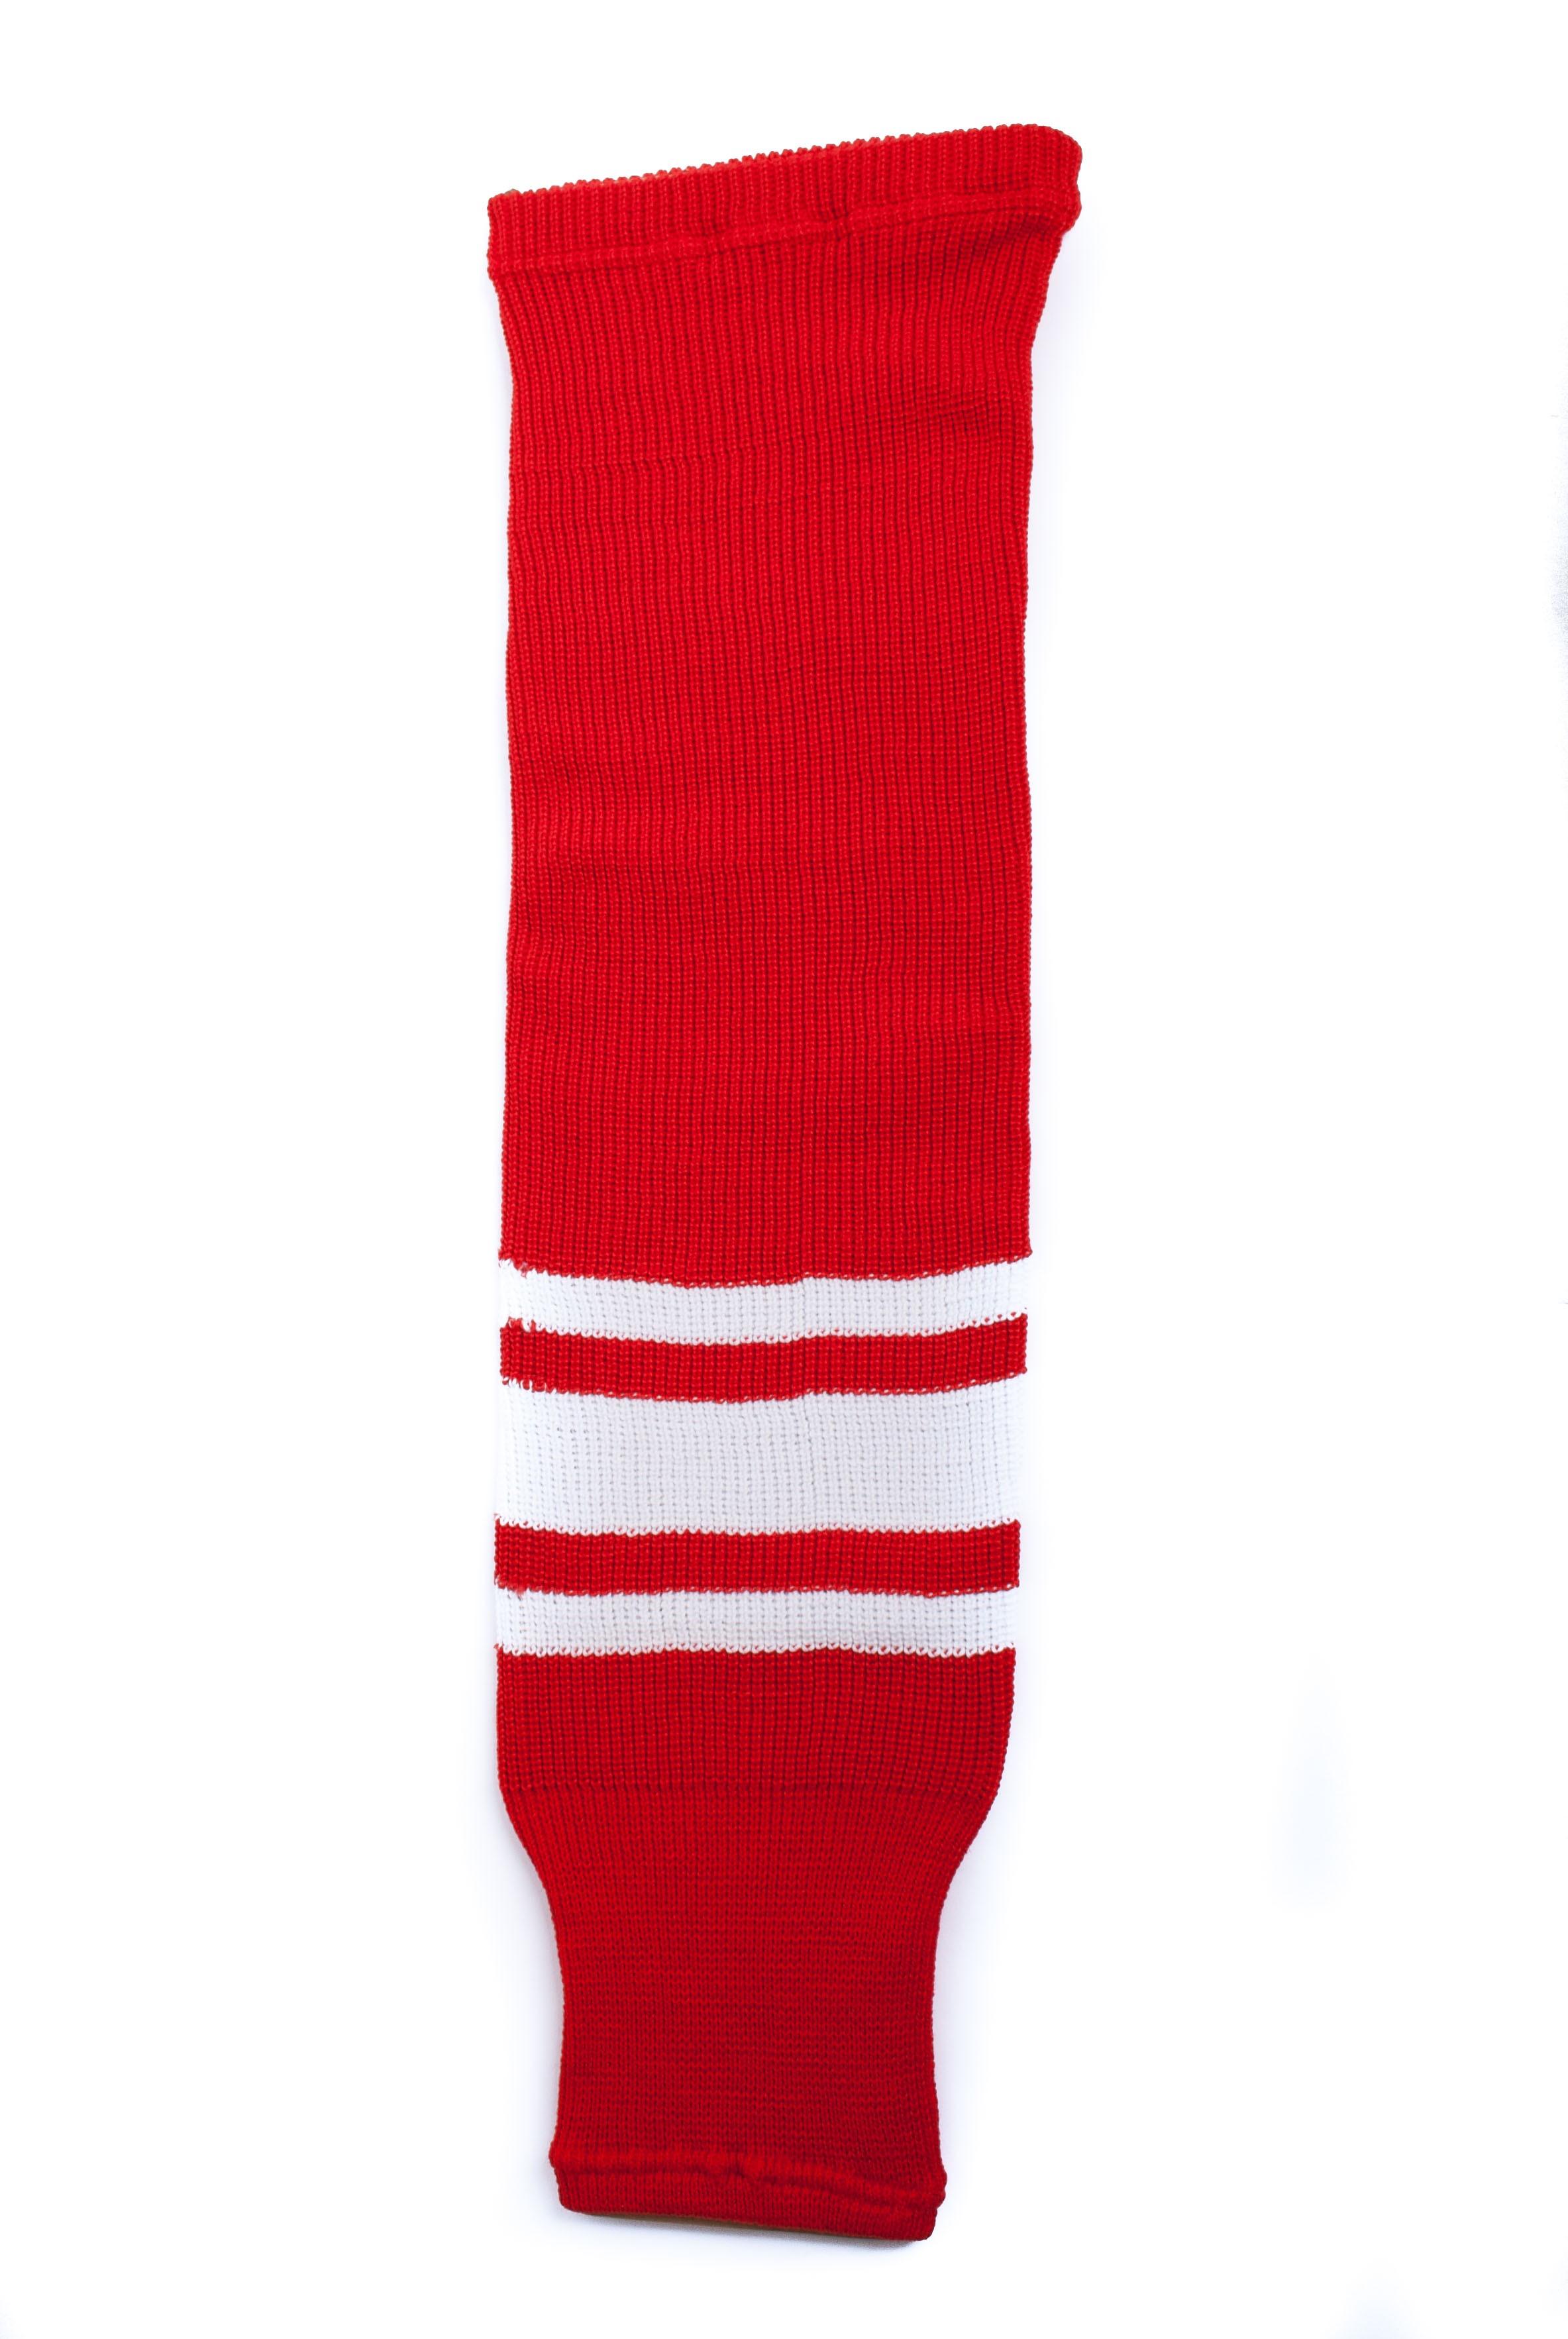 HOKEJAM.LV Knit Pieaugušo Hokeja Getras #007